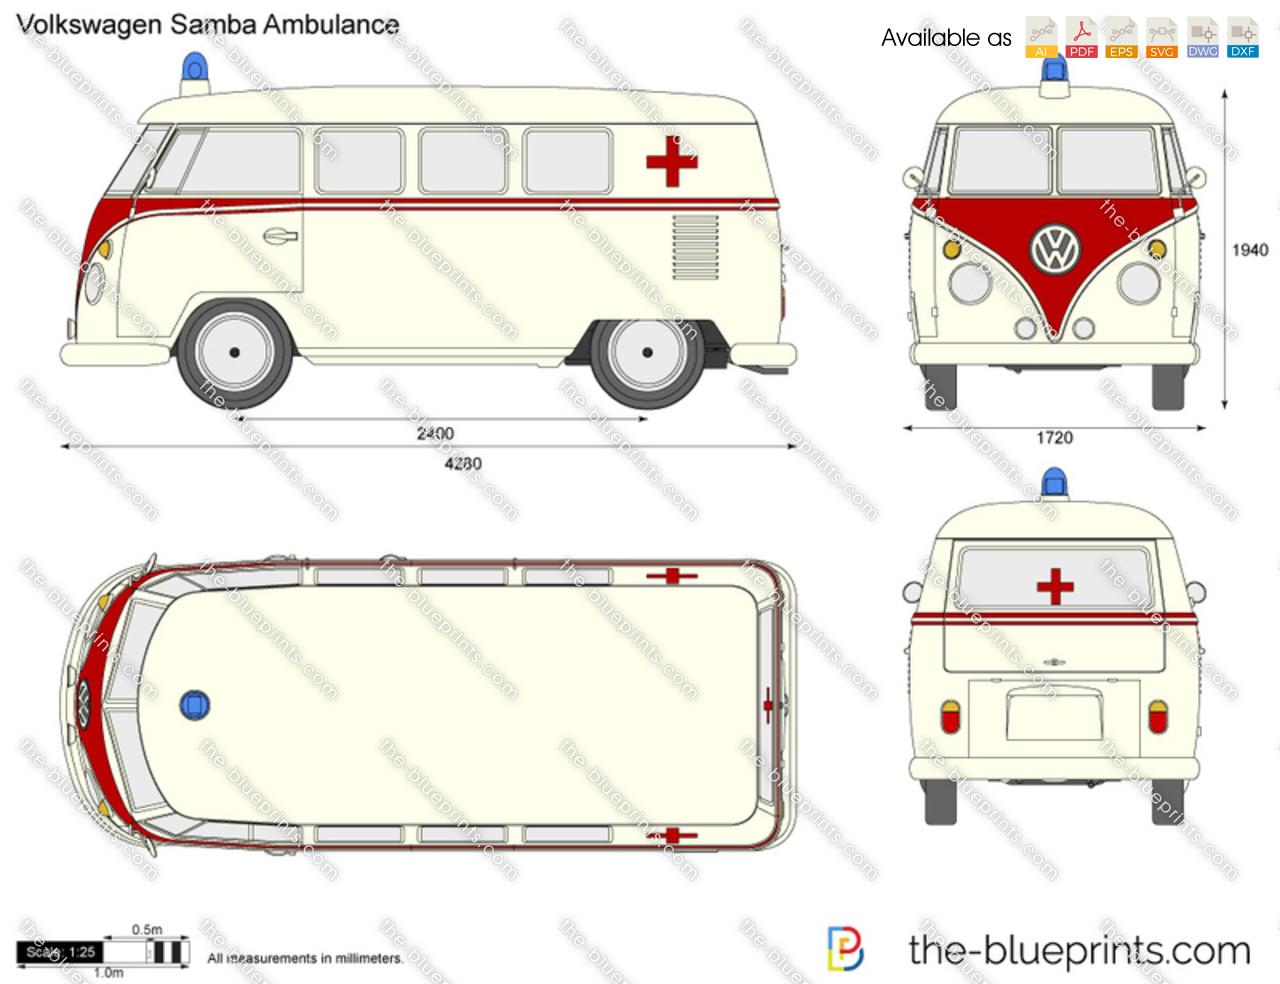 Volkswagen Samba Ambulance